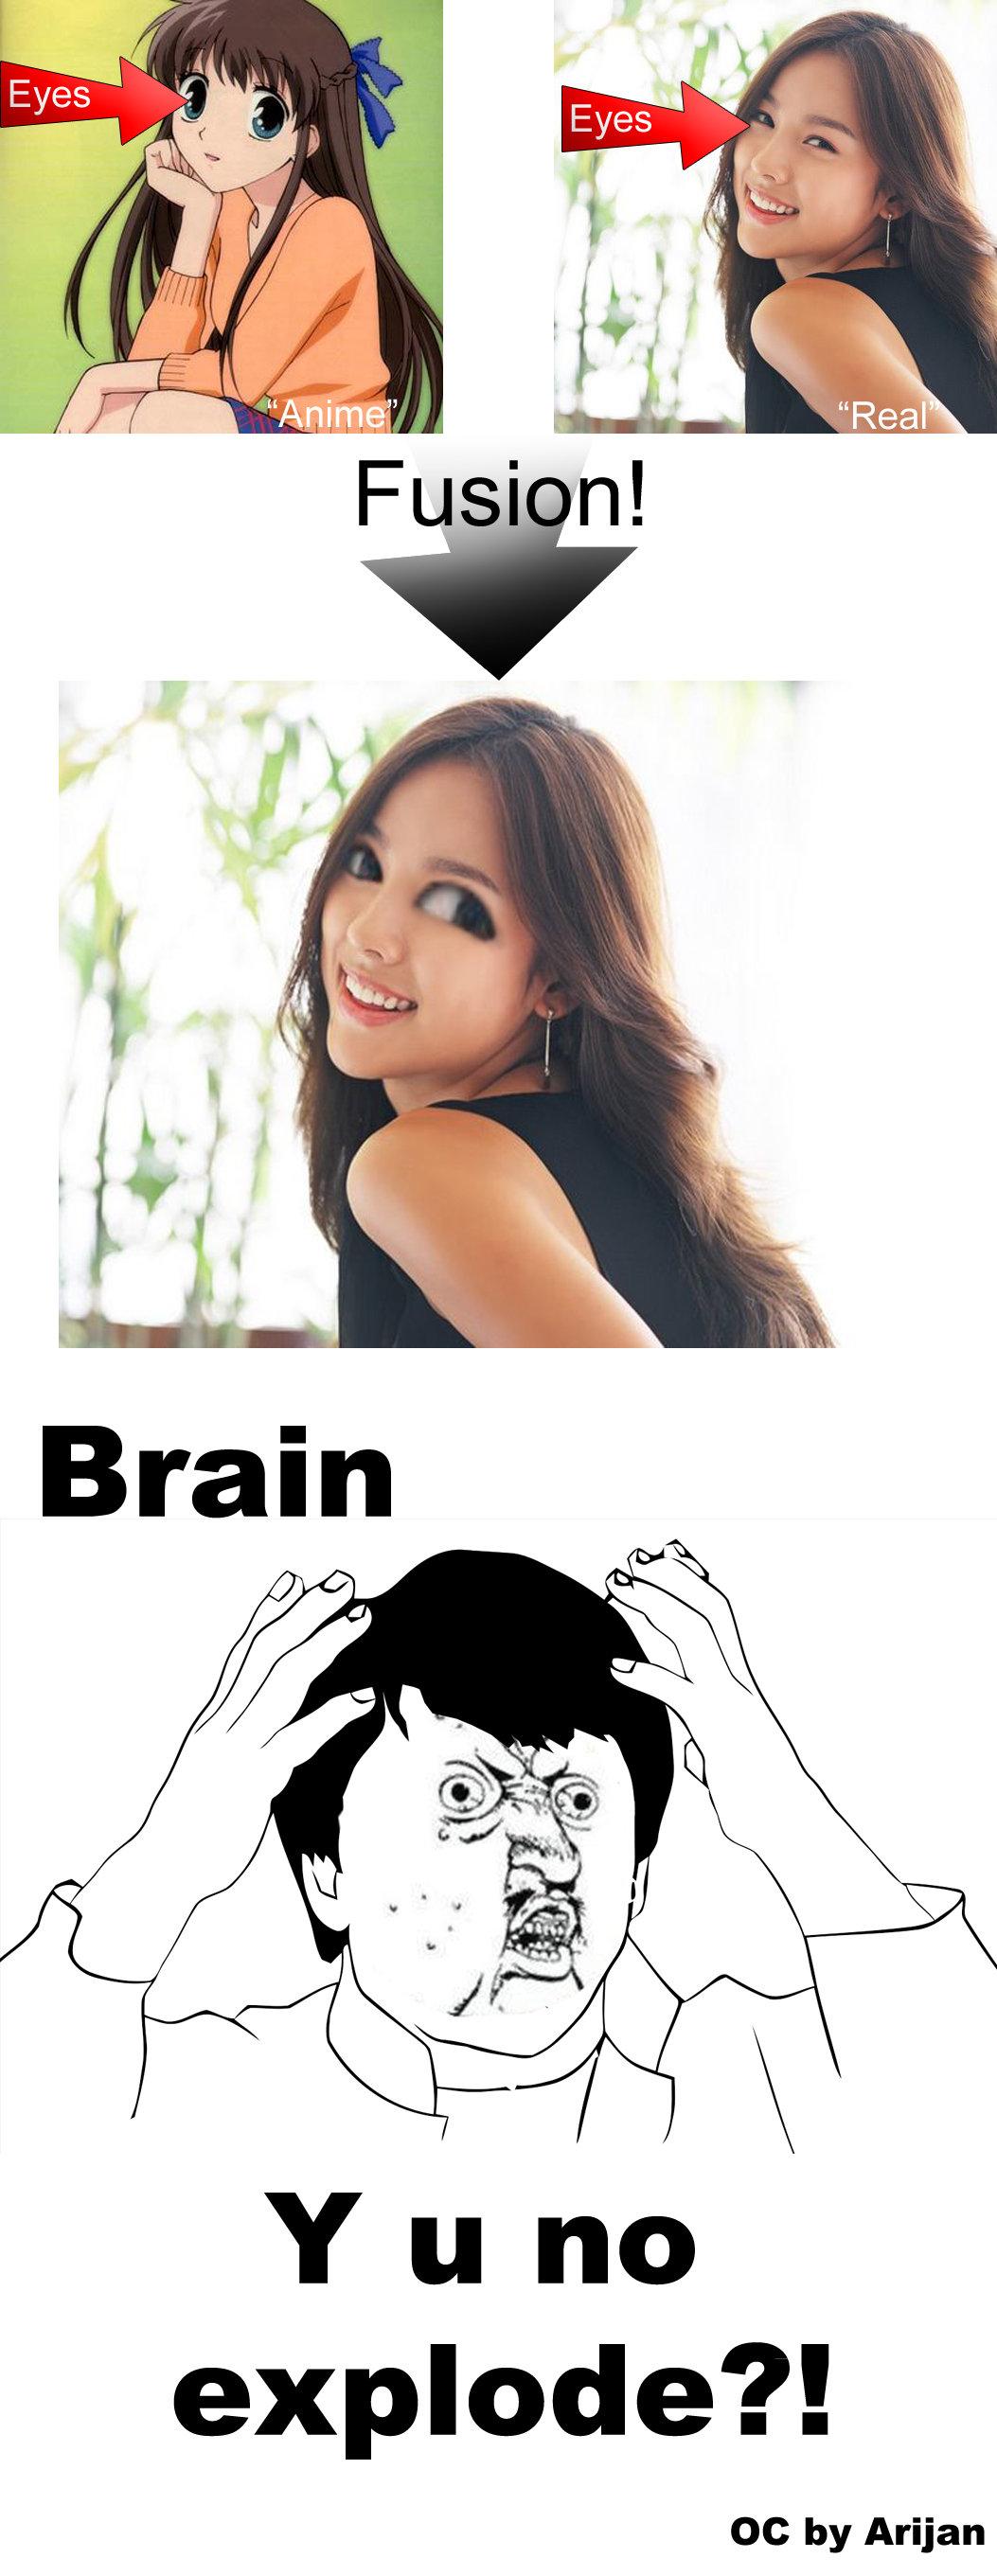 Anime reality